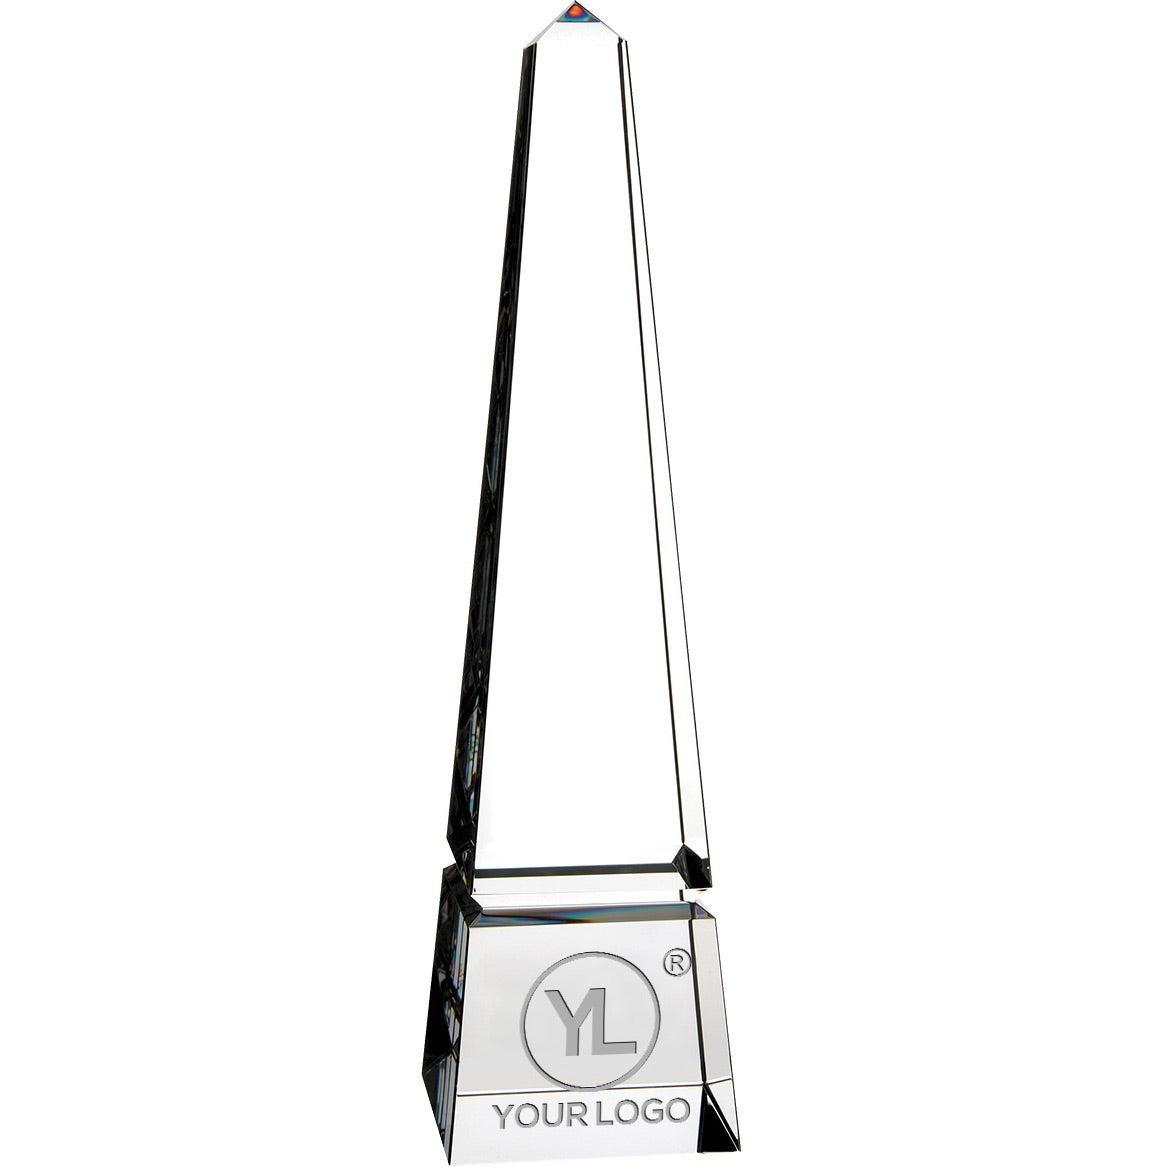 Barclay Obelisk